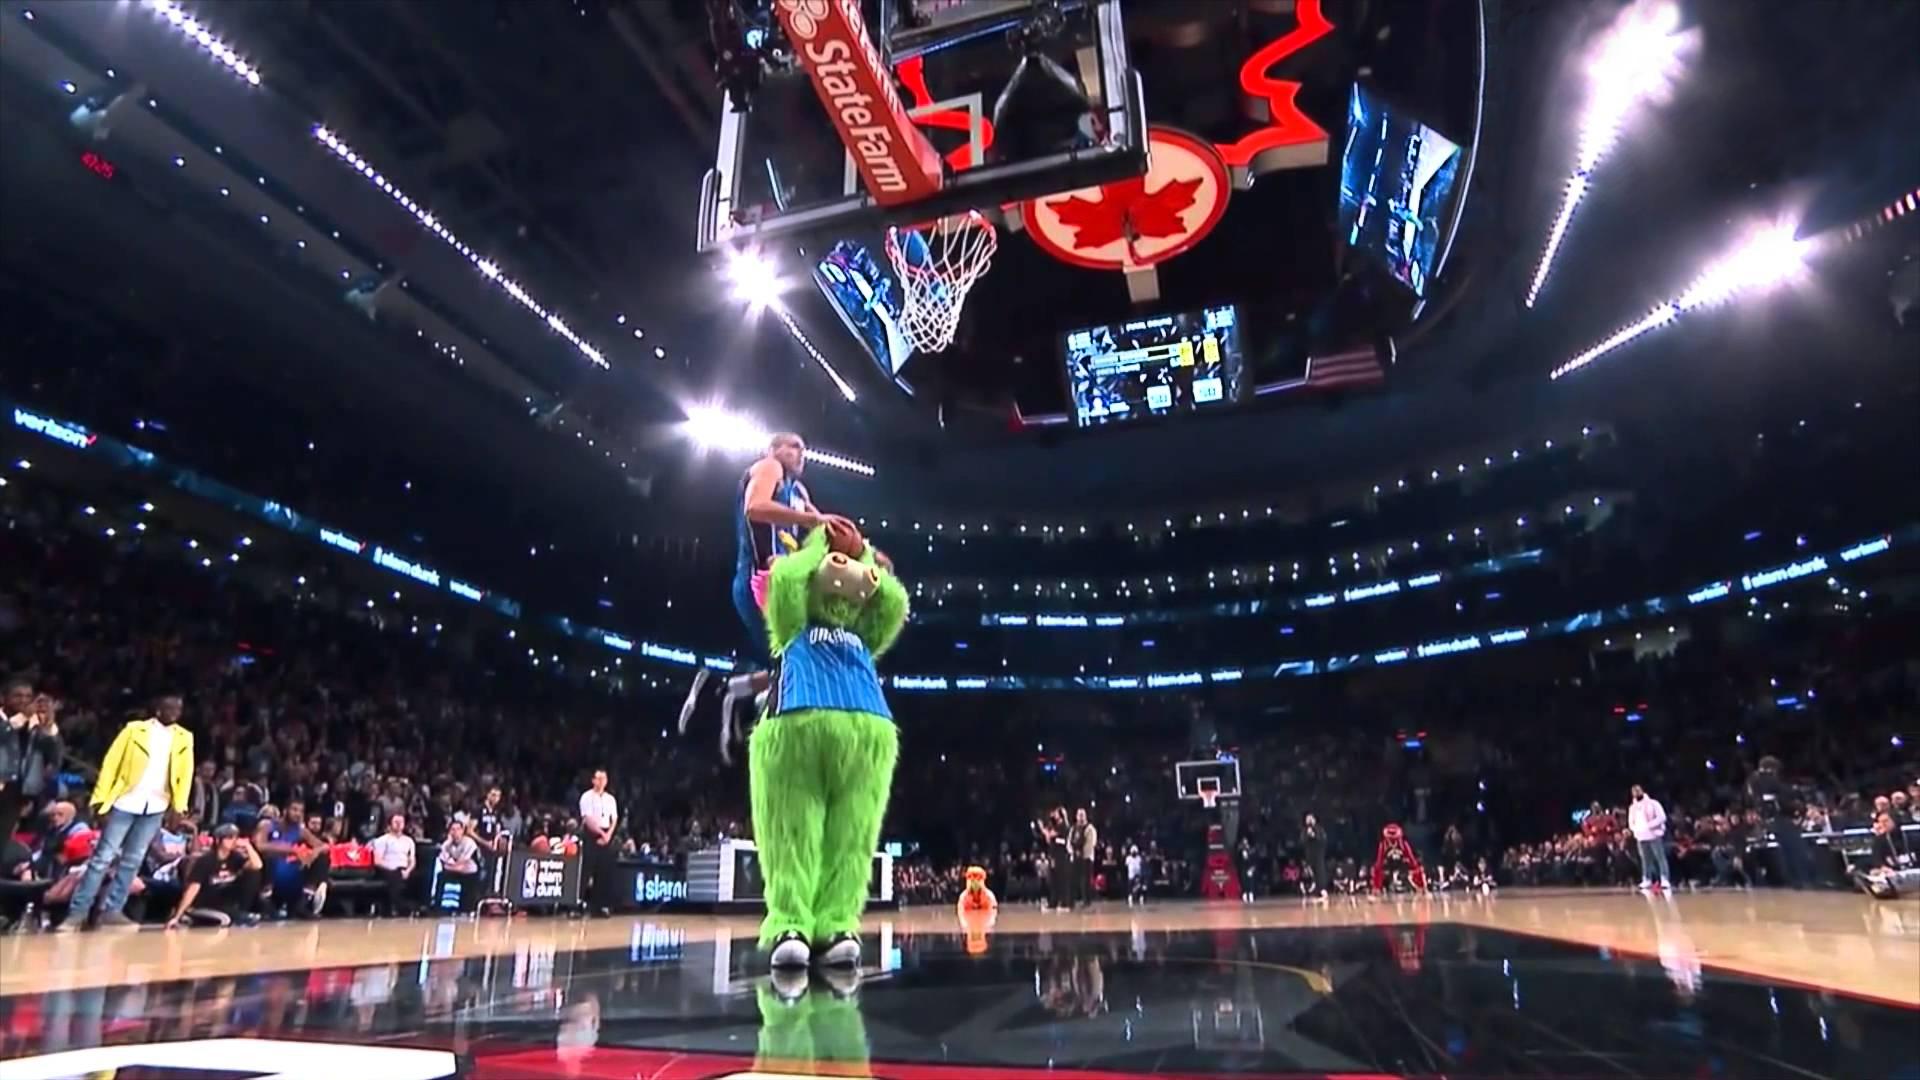 Air Canada Center, Toronto Maple Leafs, Toronto Raptos NBA All Star 2016